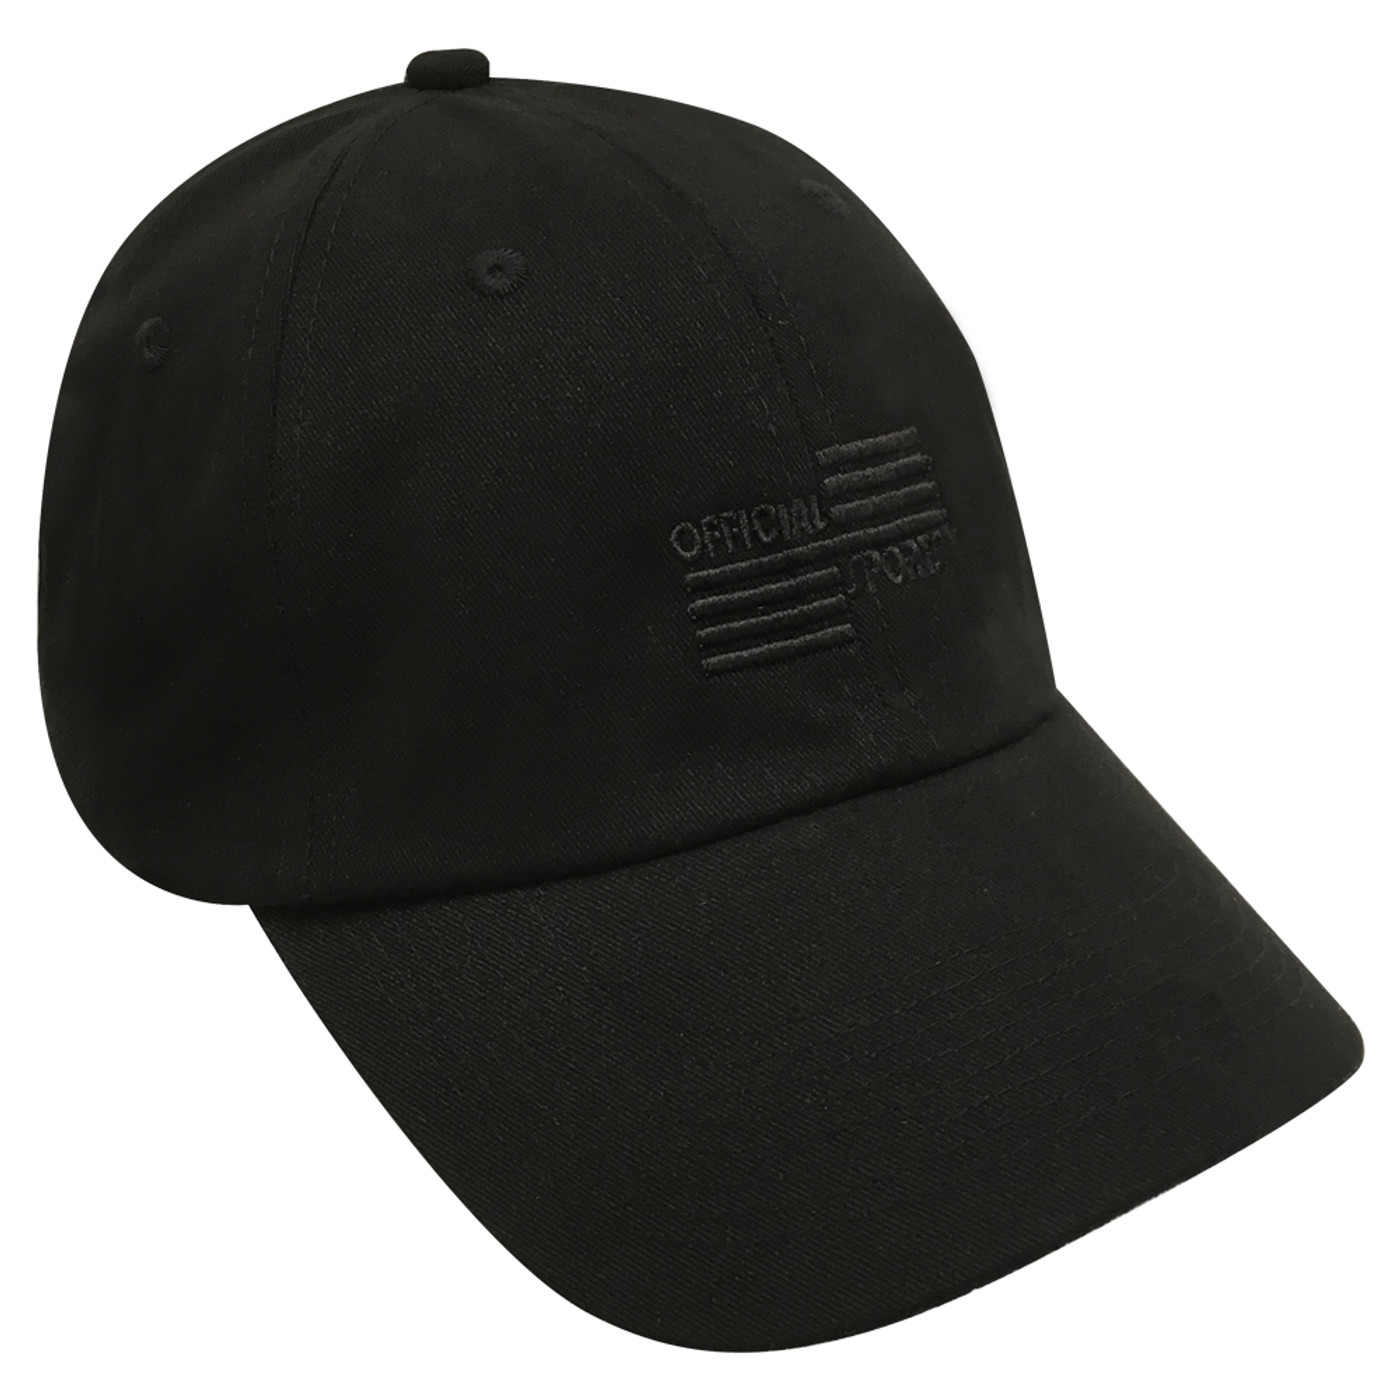 3024B Black Low Fit Cap W/Black OSI